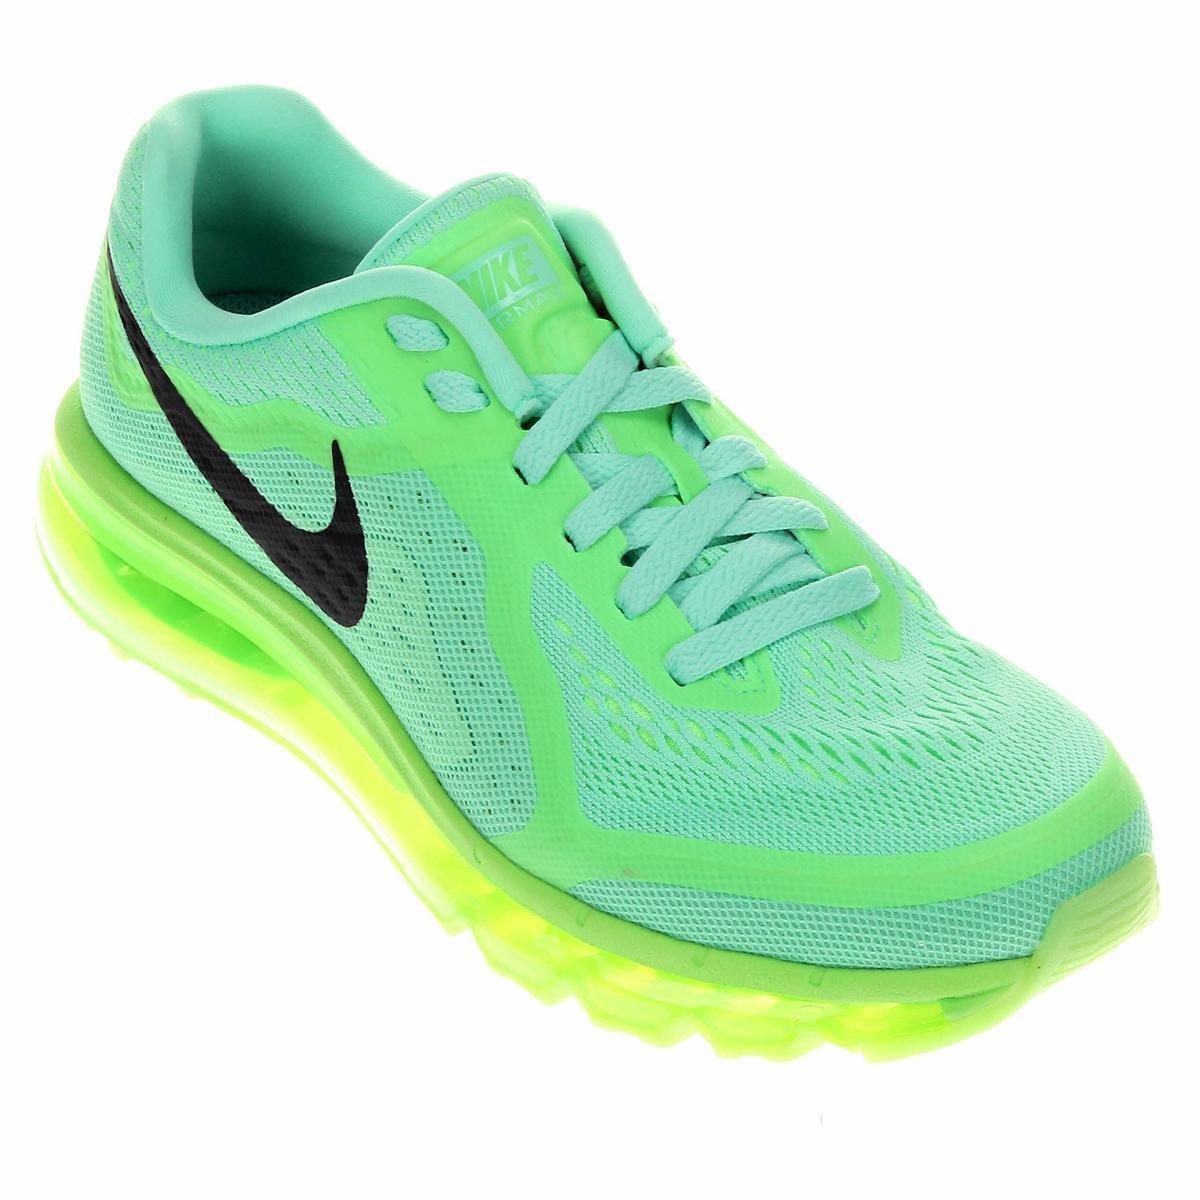 Verde Air 2014 Max Nike Tênis Água 8mnwNv0yO